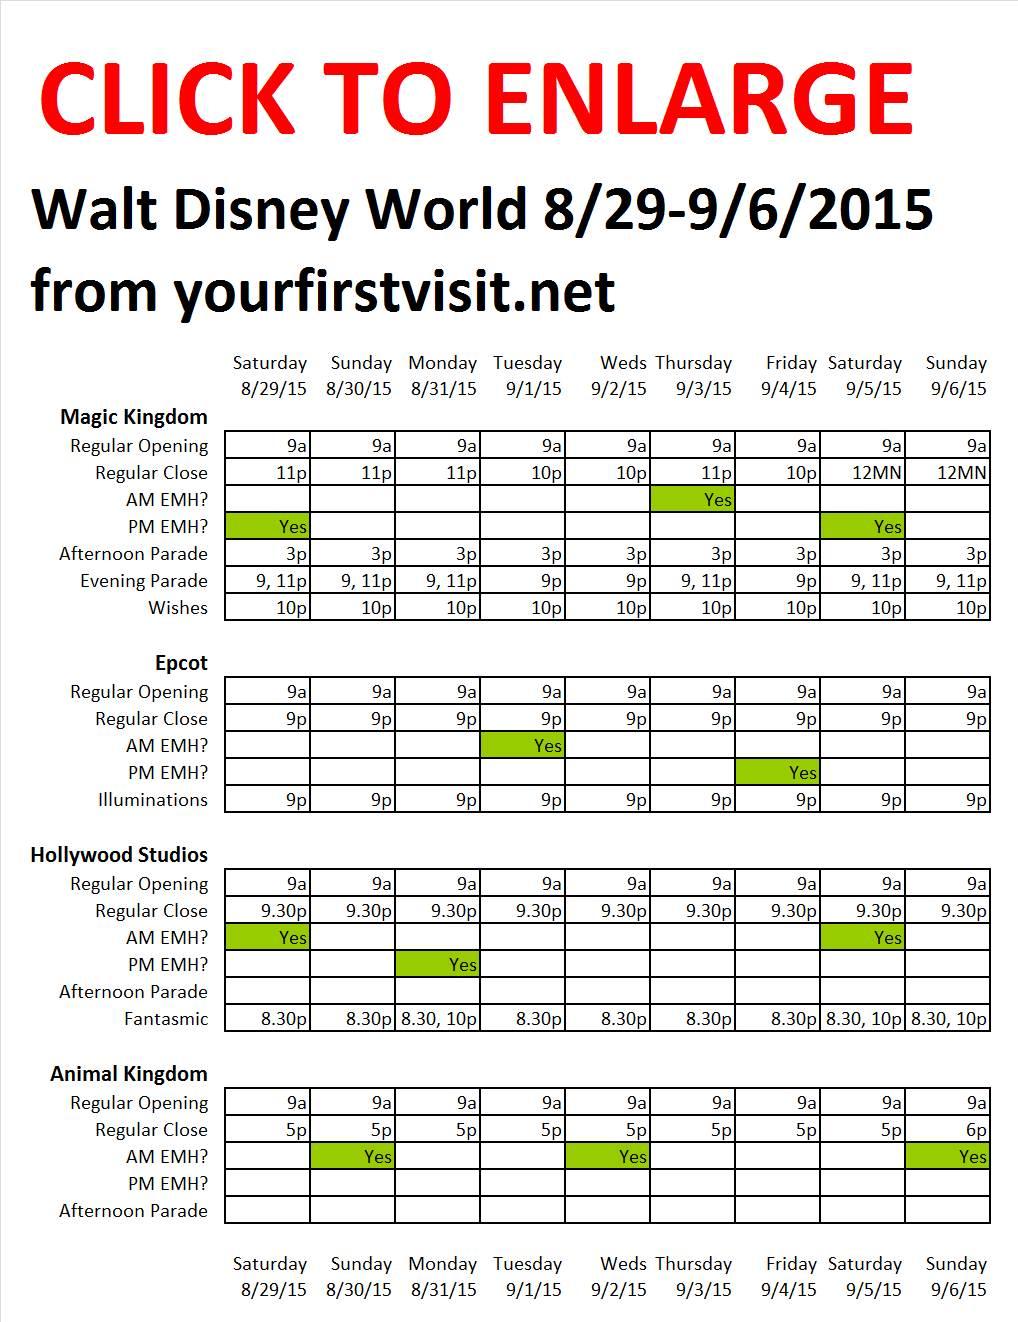 Disney World 8-29 to 9-6-2015 from yourfirstvisit.net